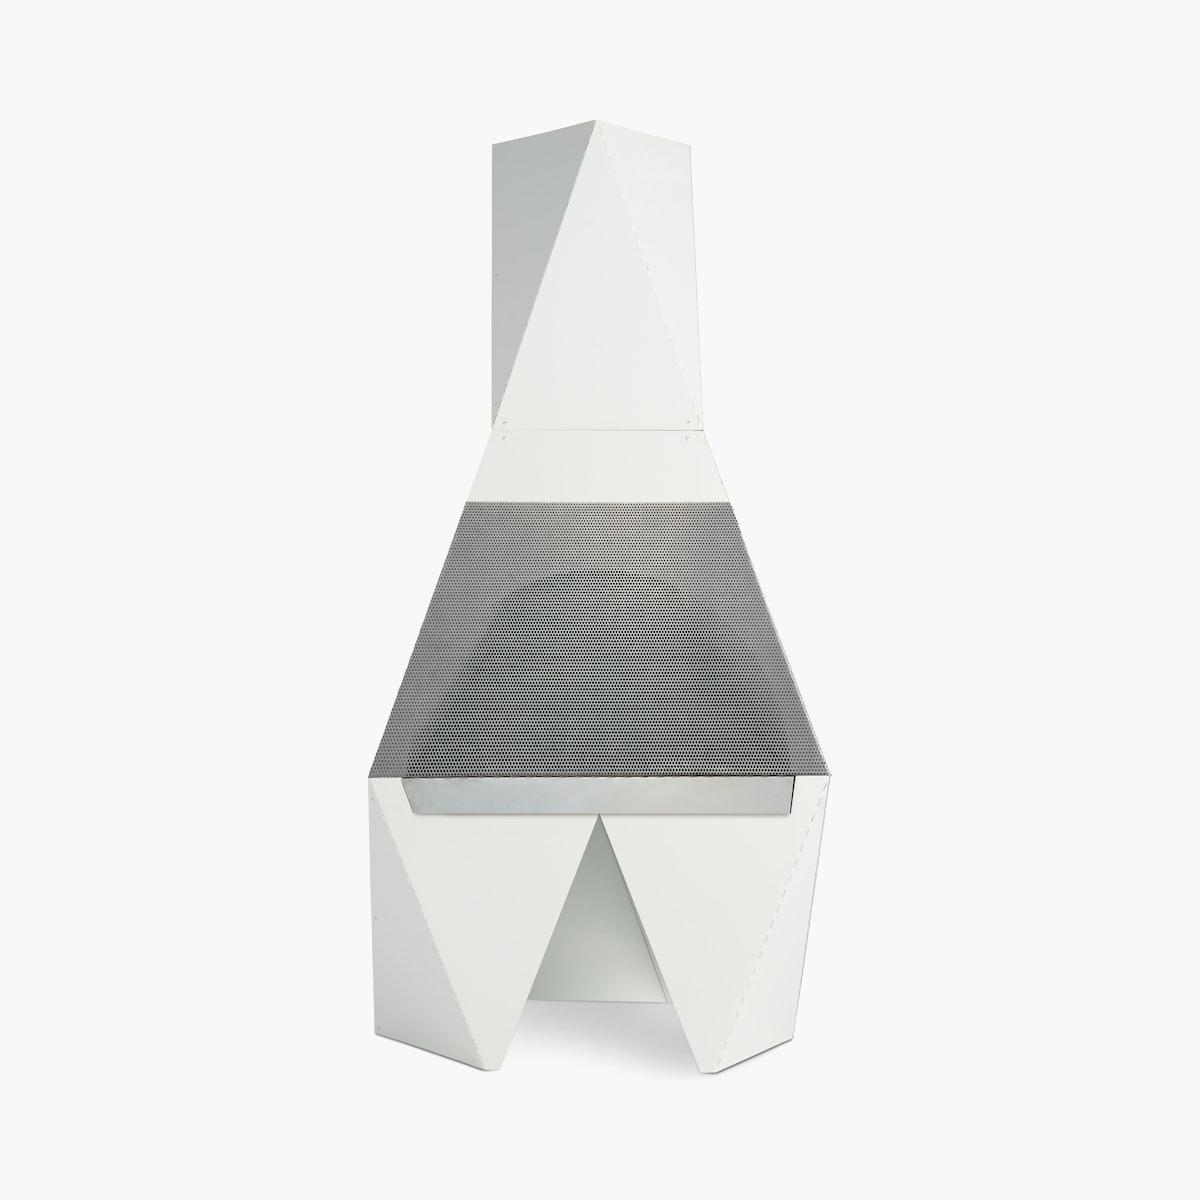 Prism Chiminea